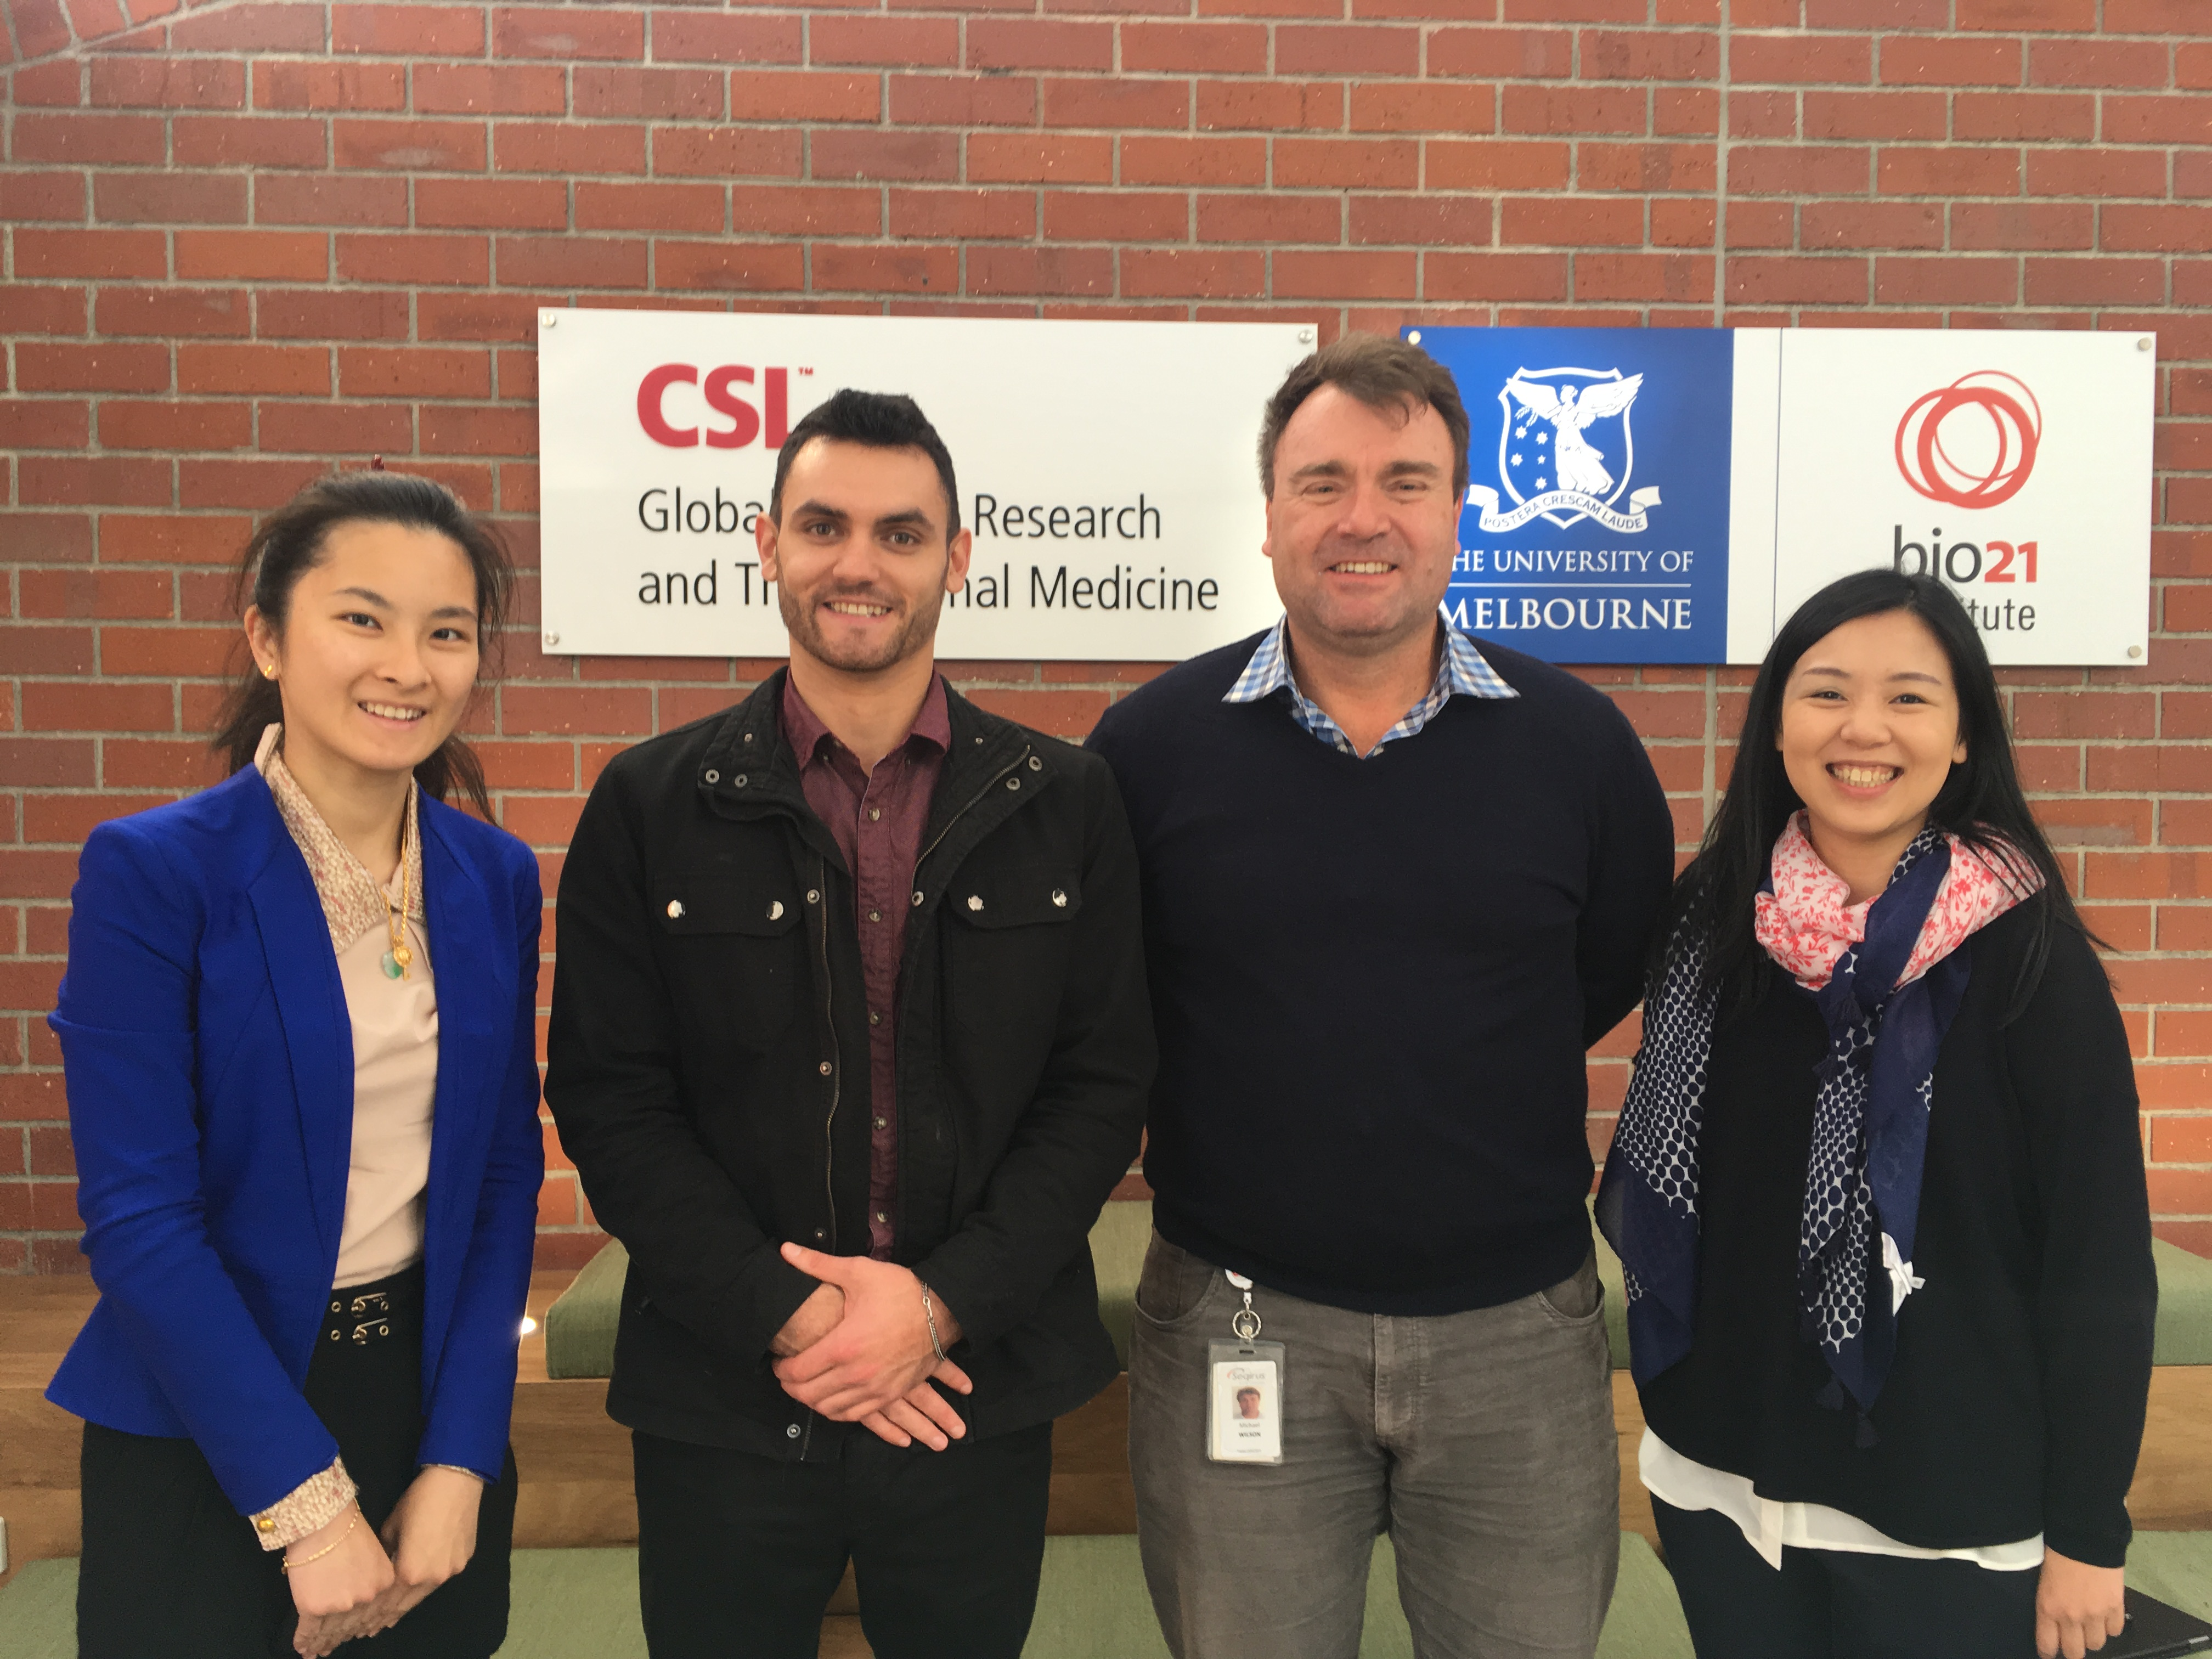 IMNIS mentees visit the new CSL labs